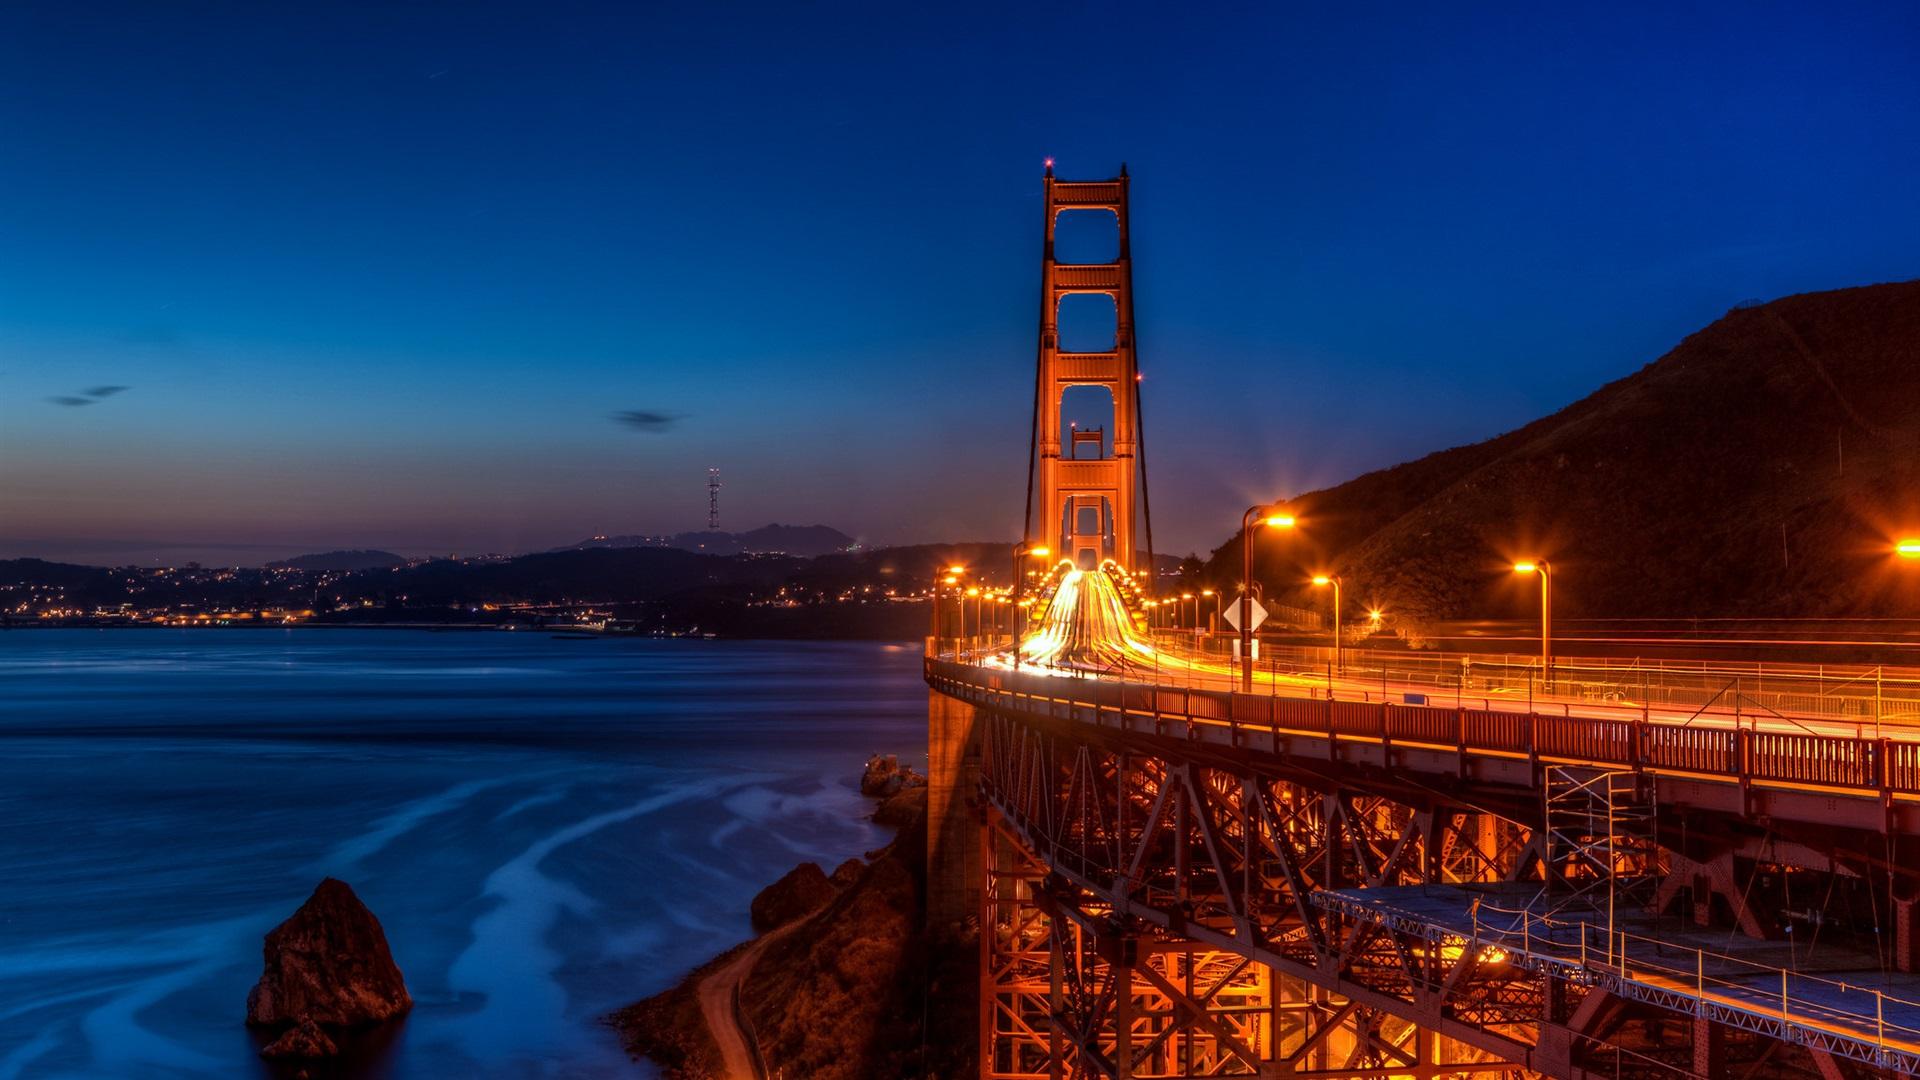 Beautiful Wallpaper Night Golden Gate Bridge - San-Francisco-Golden-Gate-Bridge-night-lights-city-USA_1920x1080  Collection-33866.jpg